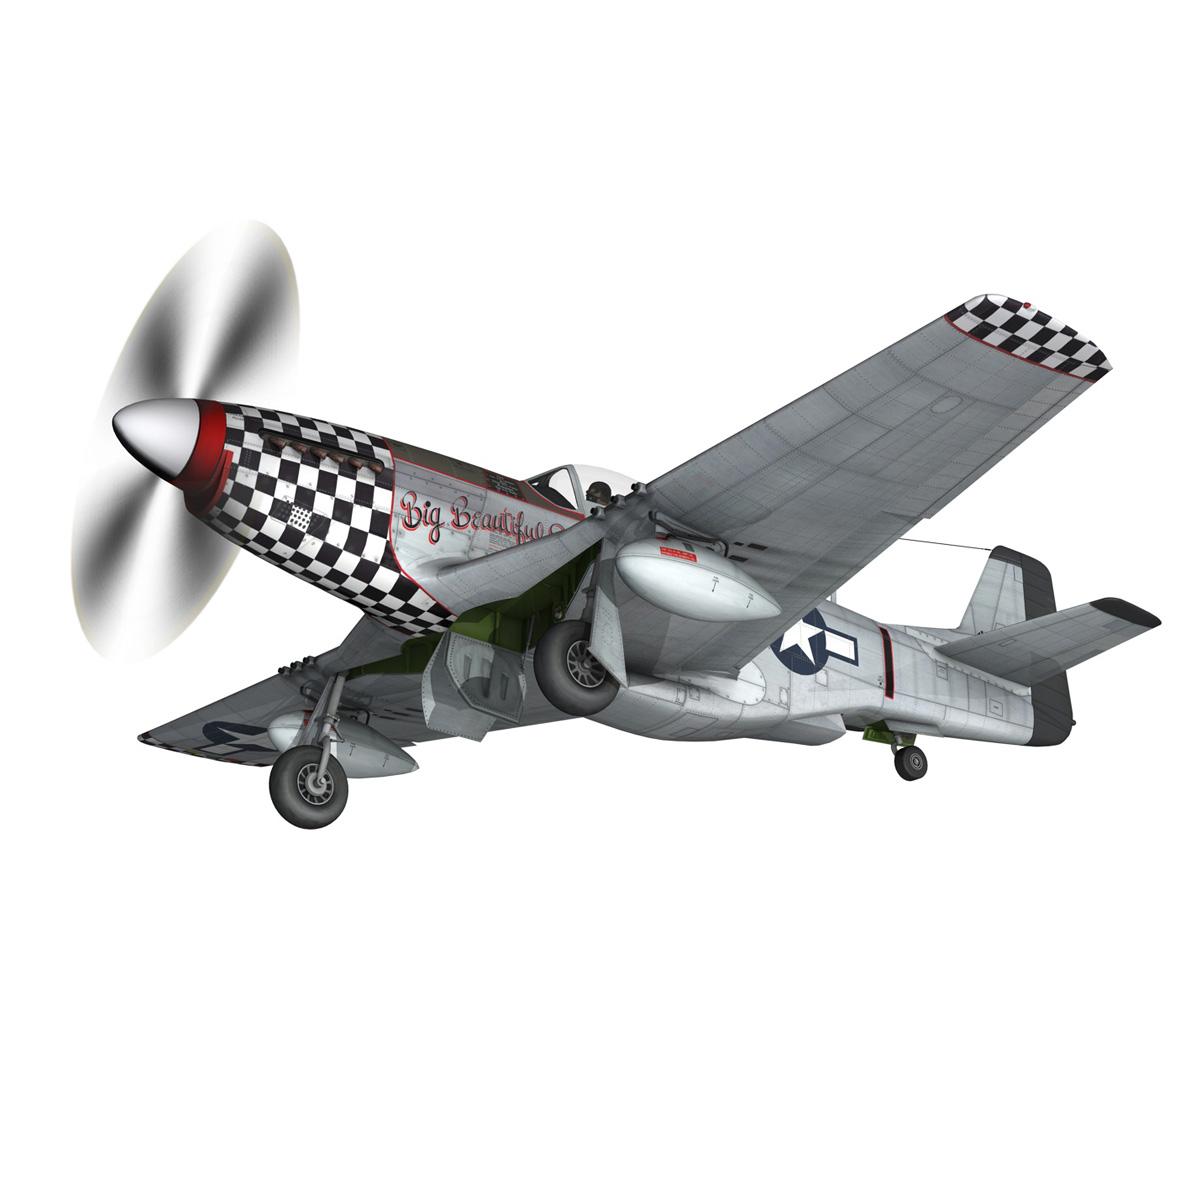 north american p-51d mustang – big beautiful doll 3d model fbx c4d lwo obj 282559